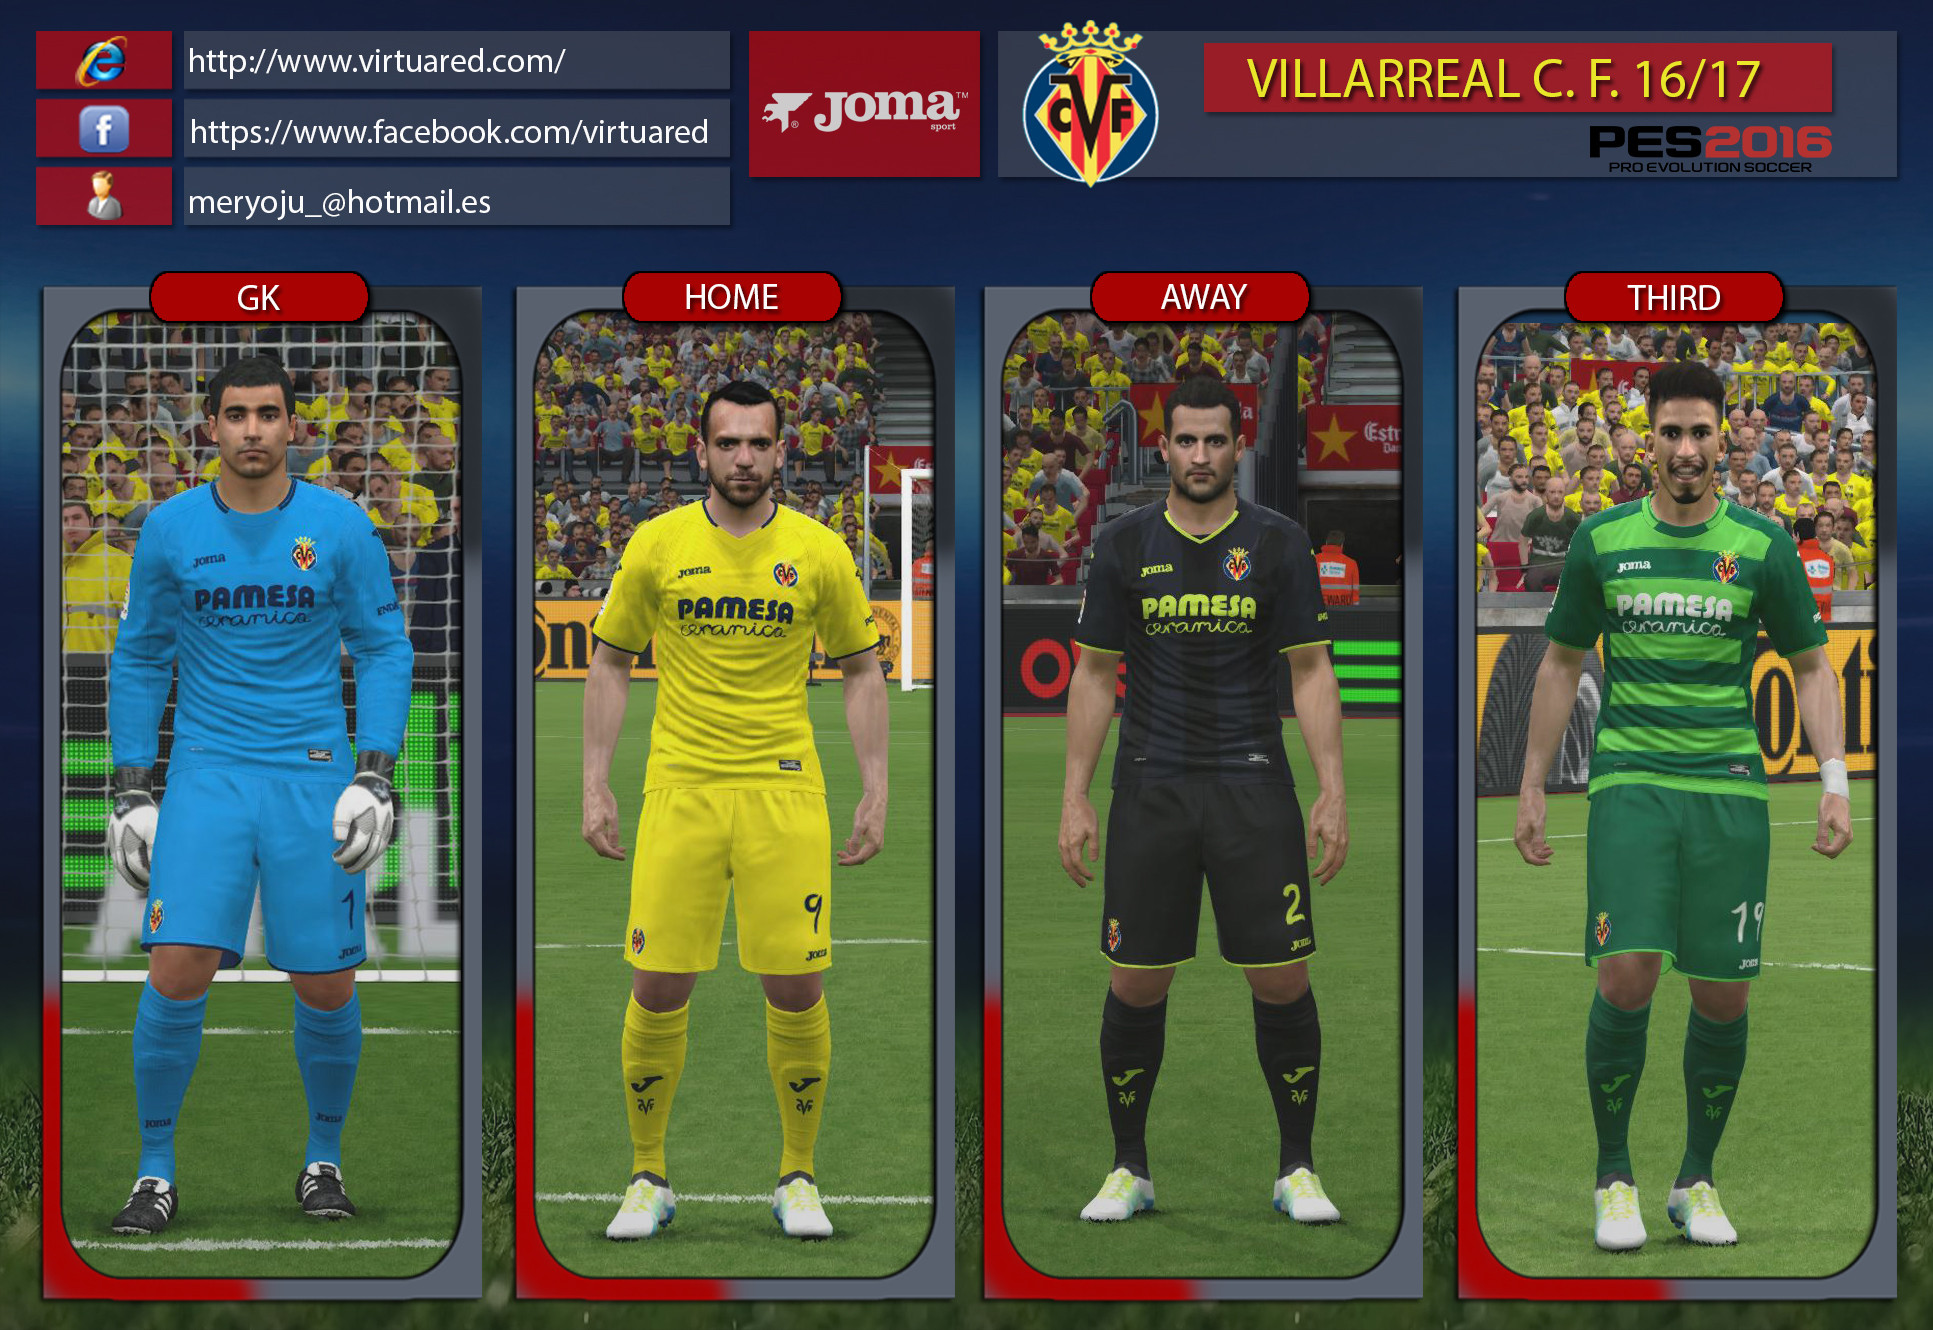 Villareal CF 16/17 kits by Meryoju